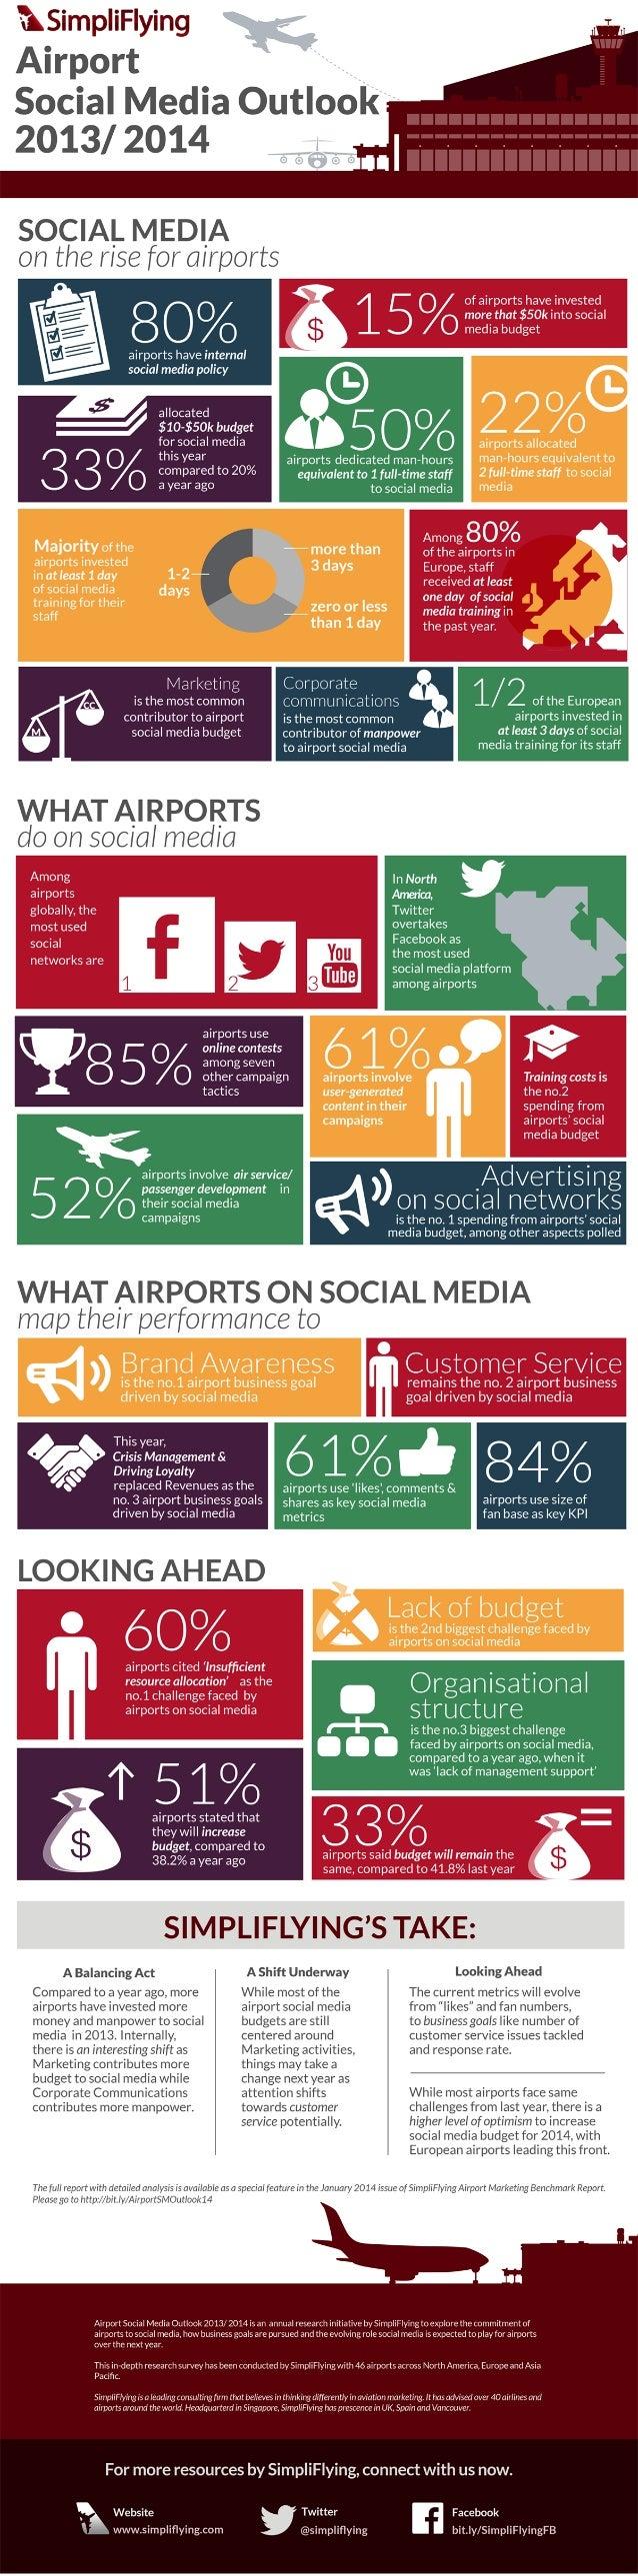 Simpliflying Airport Social Media Outlook 2013/2014